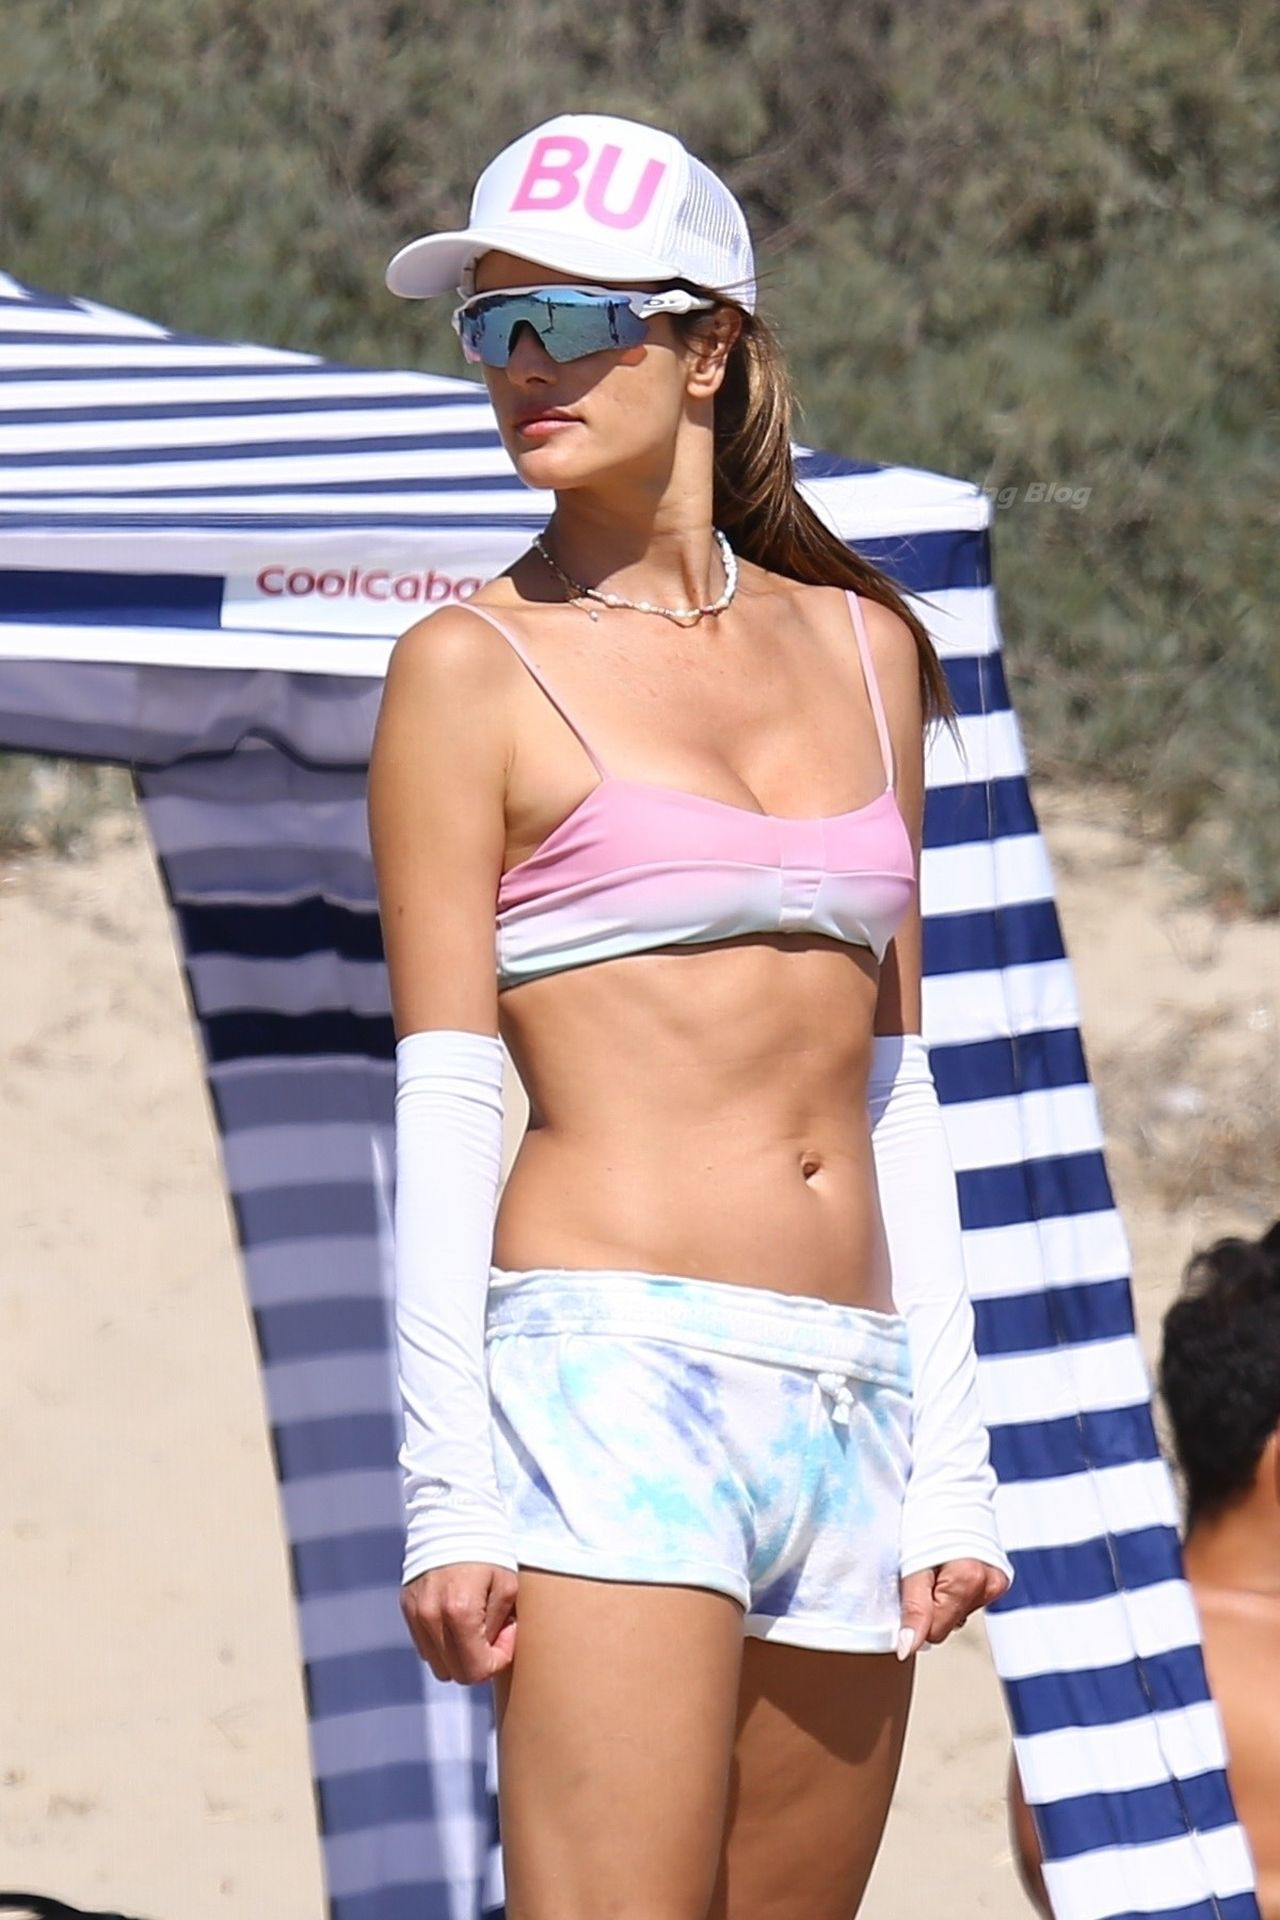 Alessandra-Ambrosio-Sexy-The-Fappening-Blog-7-2.jpg